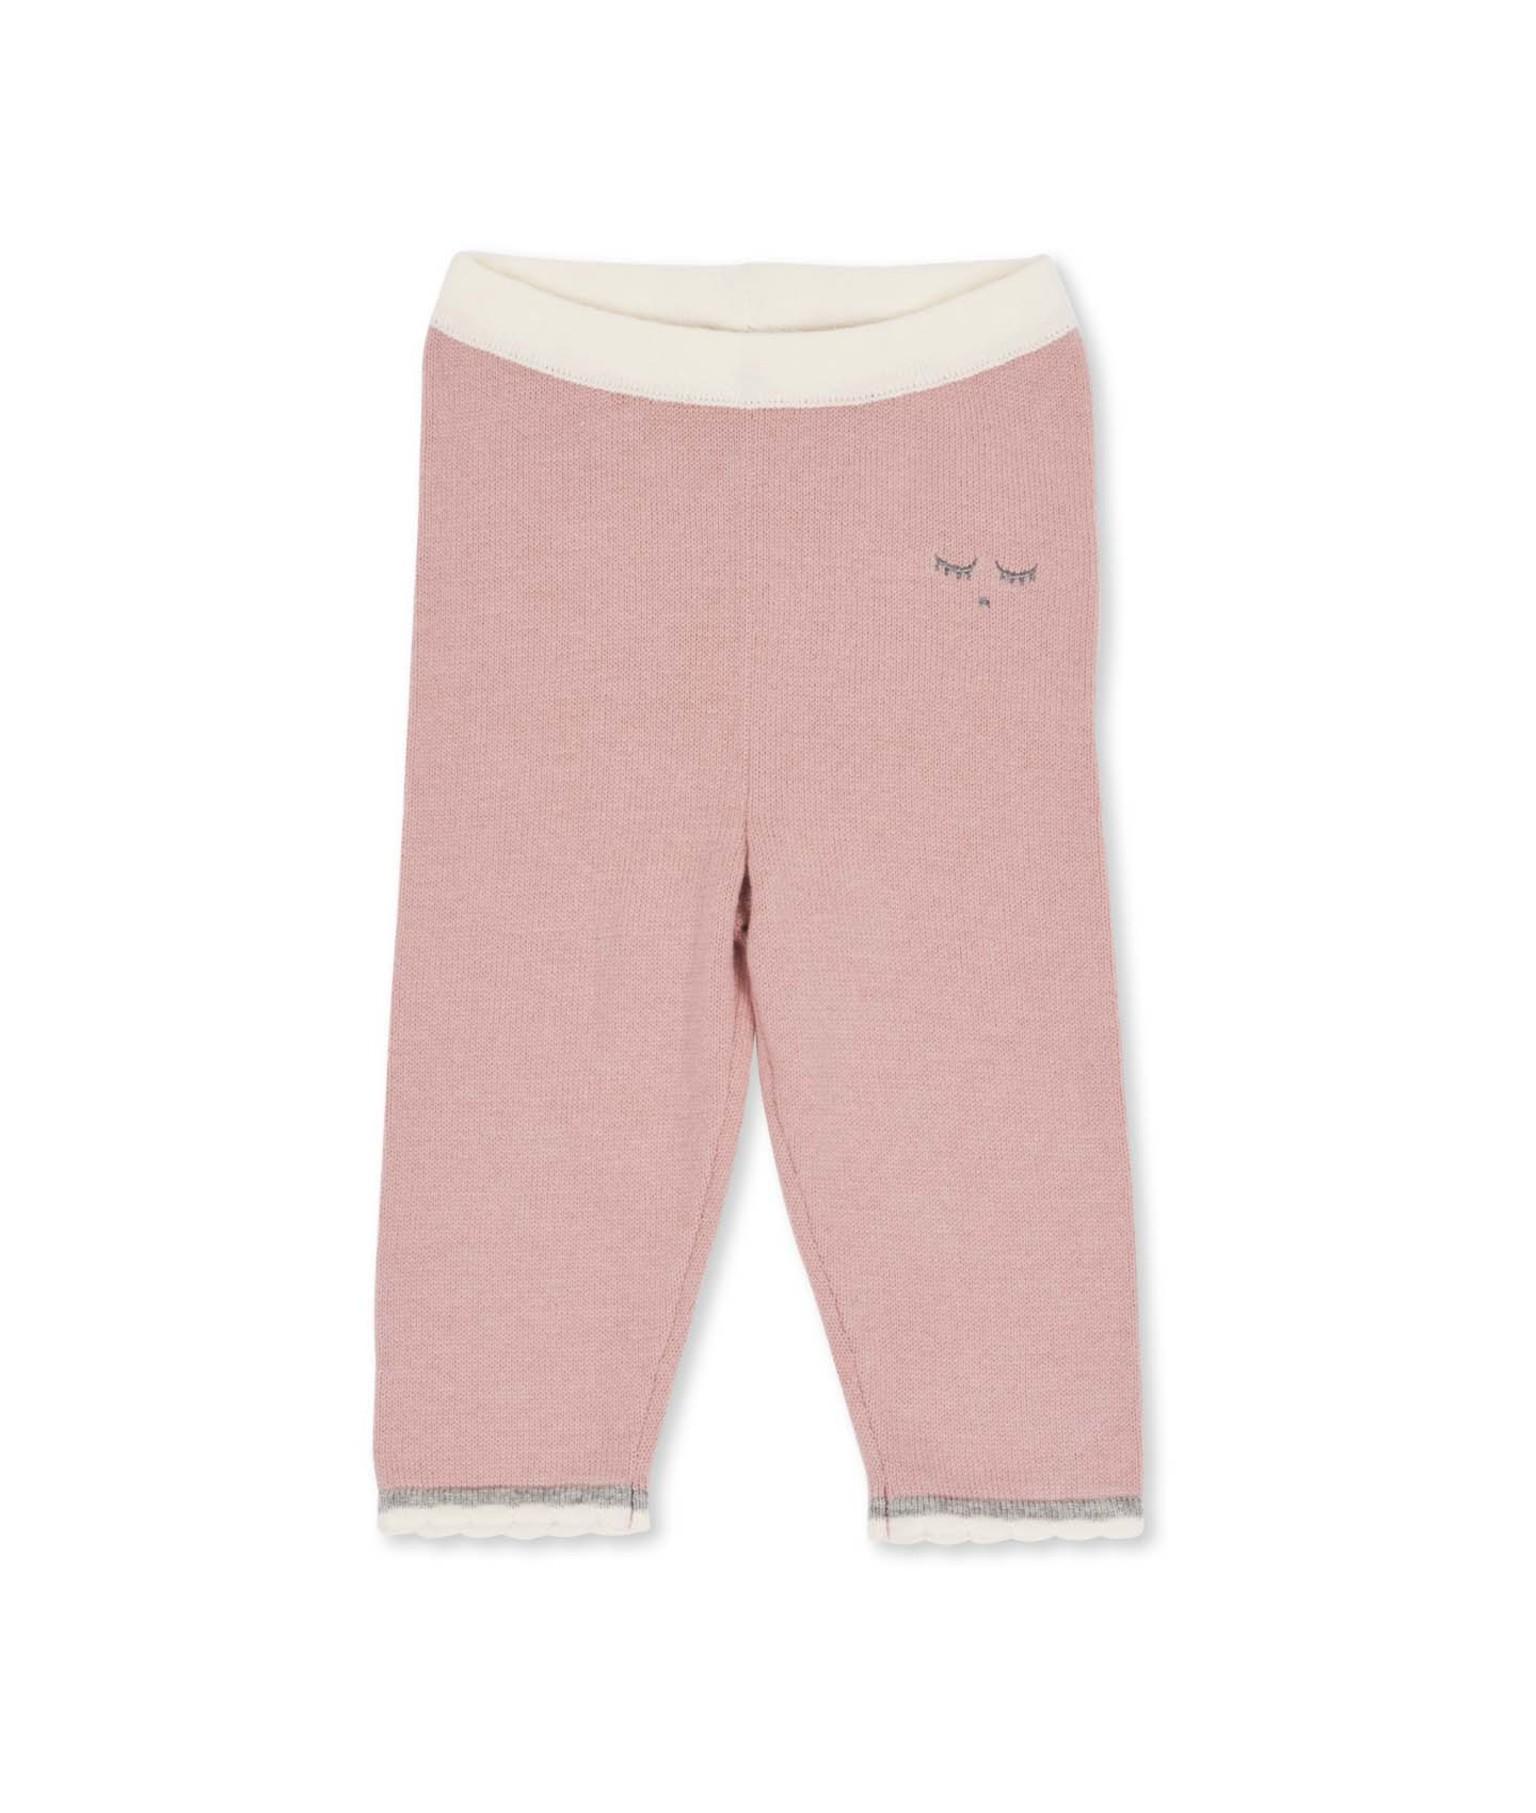 Livly  Scallop Knit  Block Pants